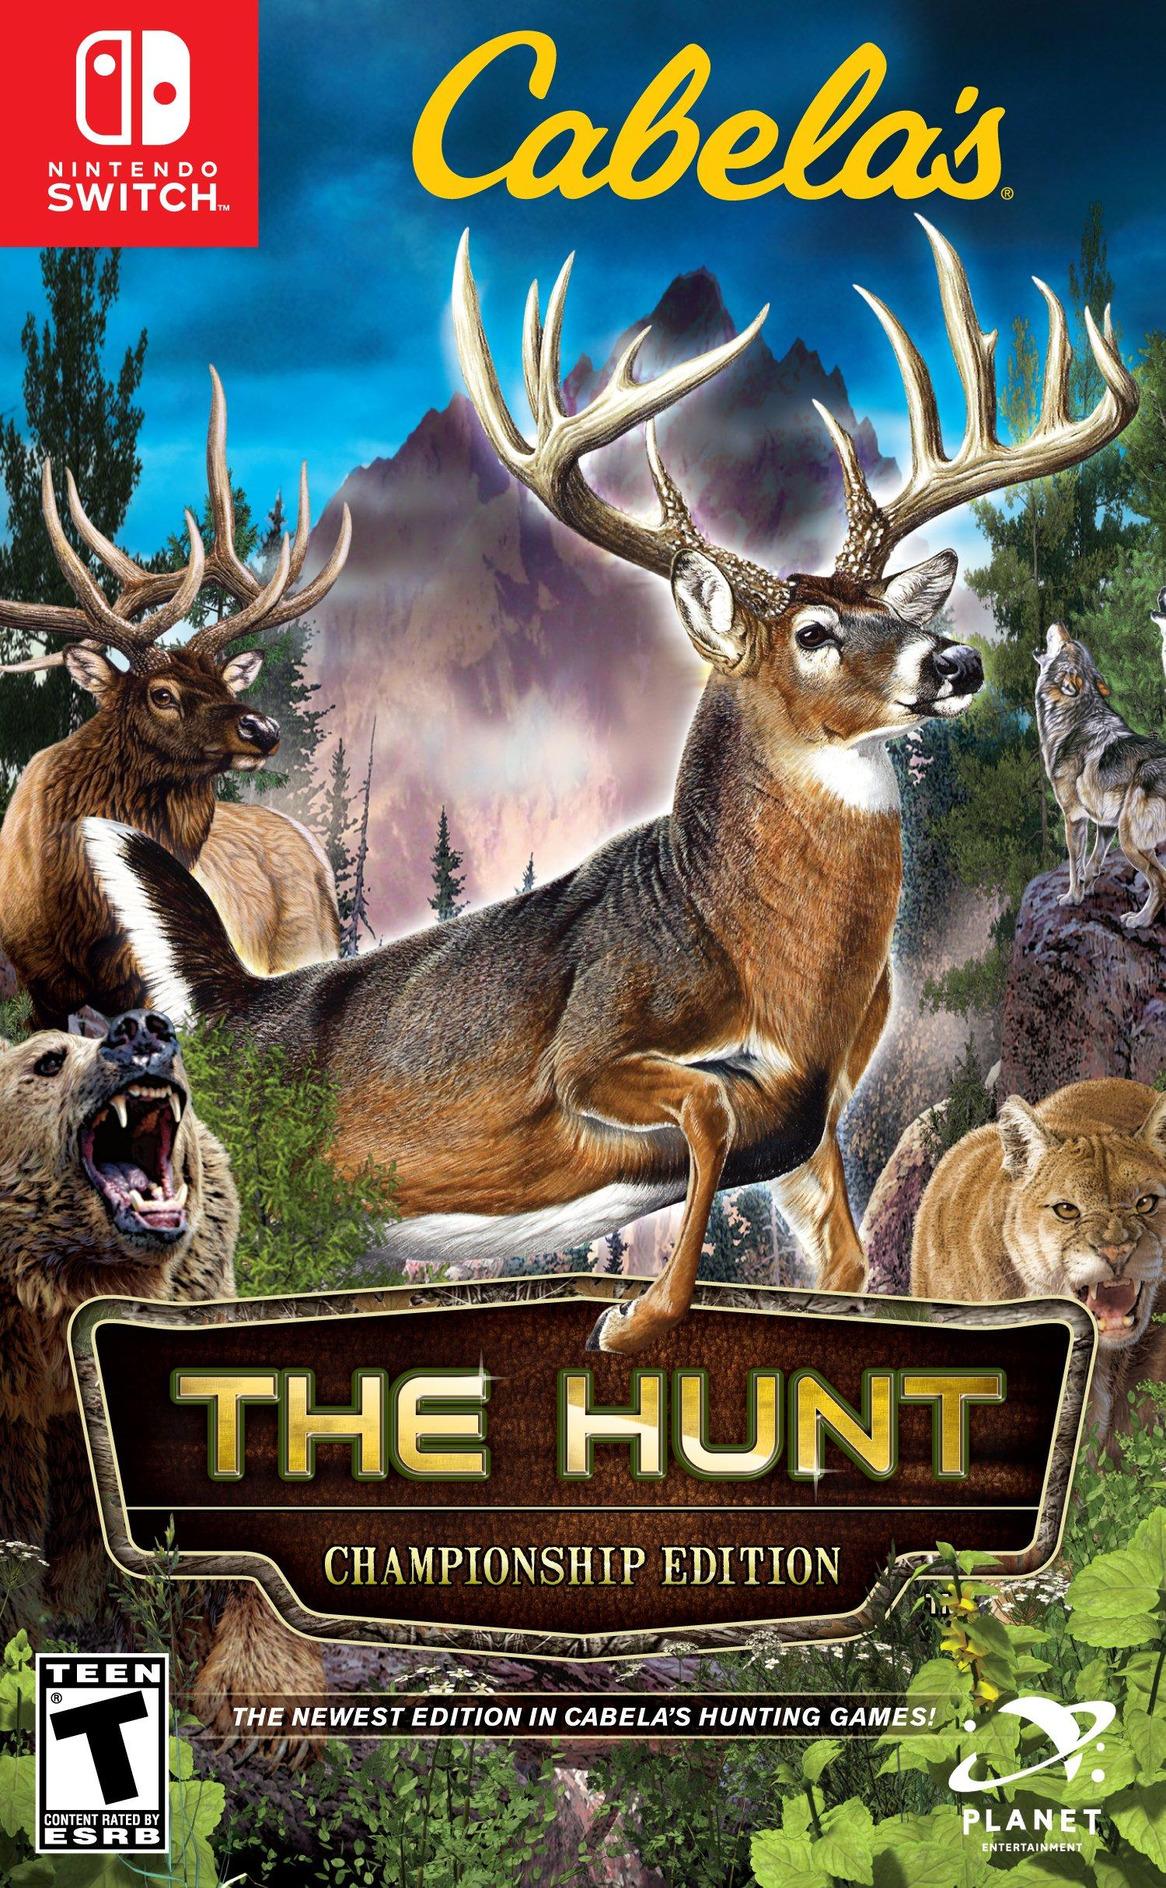 Cabela's - The Hunt - Championship Edition Switch coverHQ (AMU4A)